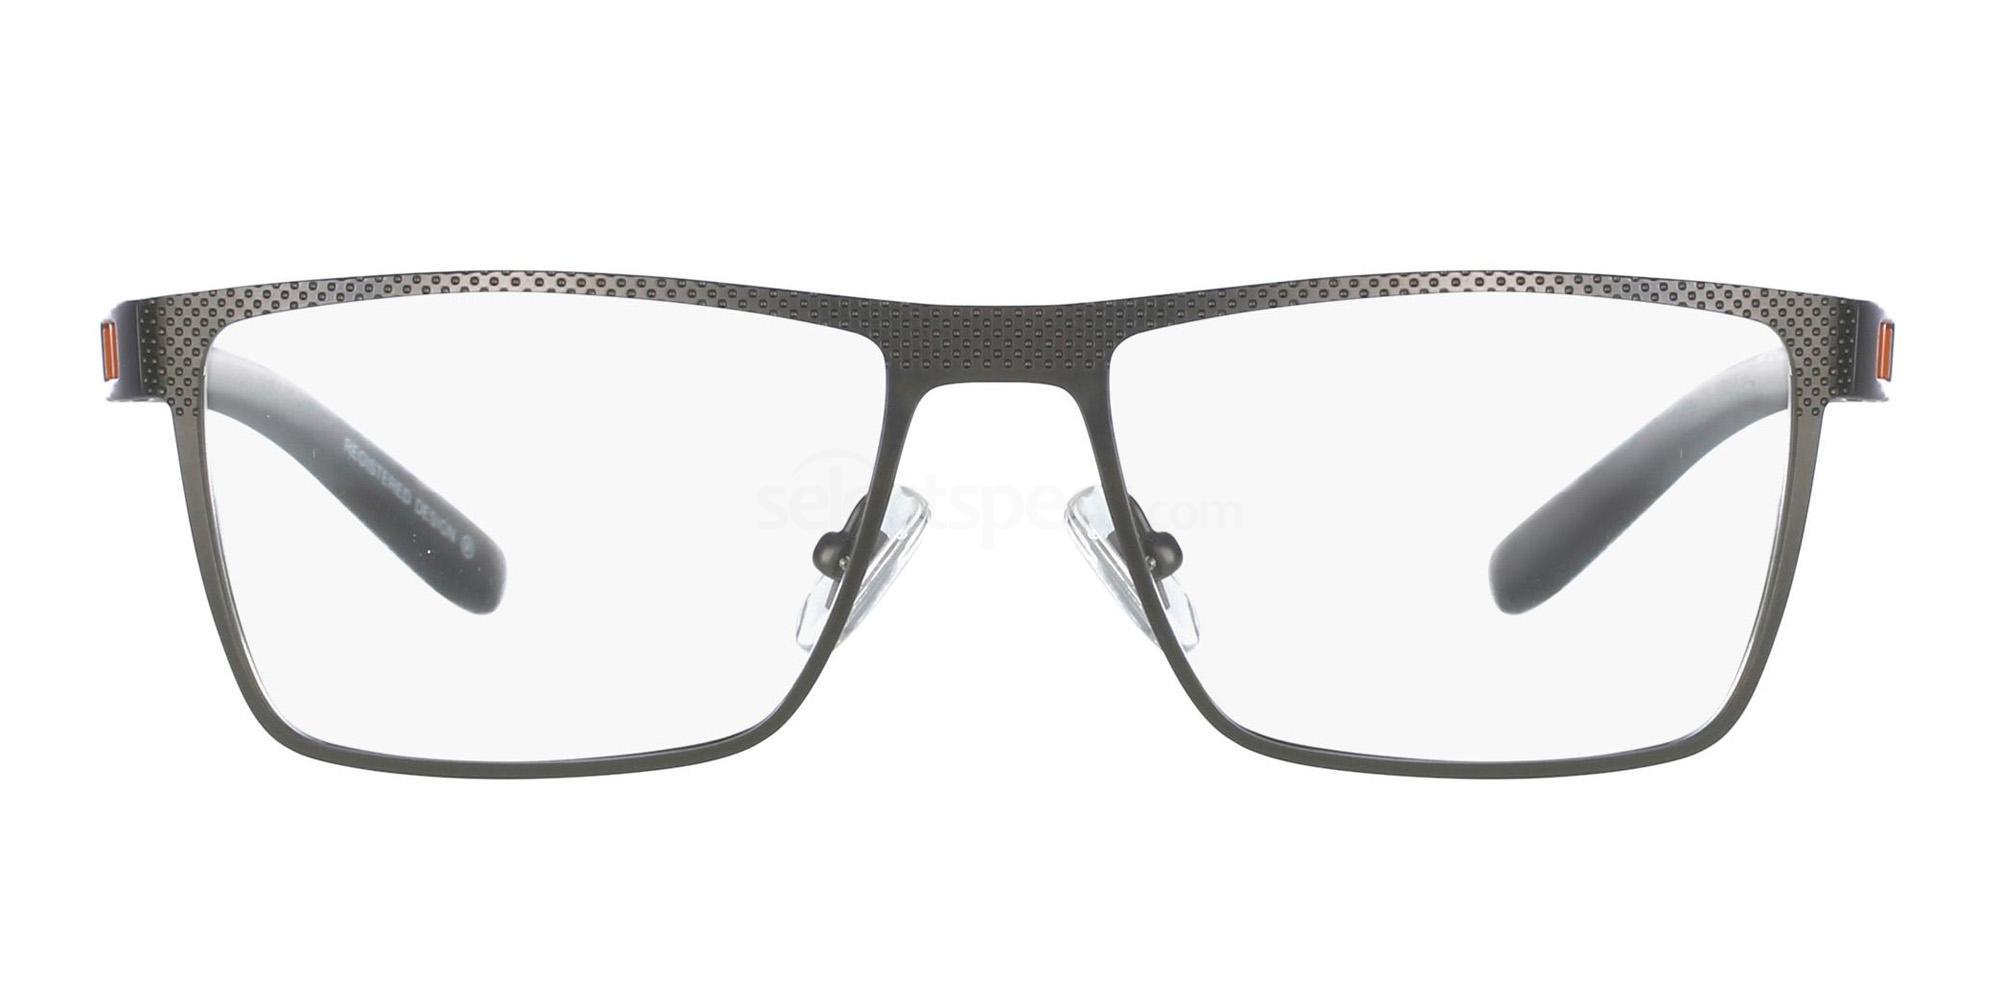 GG010 7661O COPENTOLE Glasses, ÖGA Scandinavian Spirit